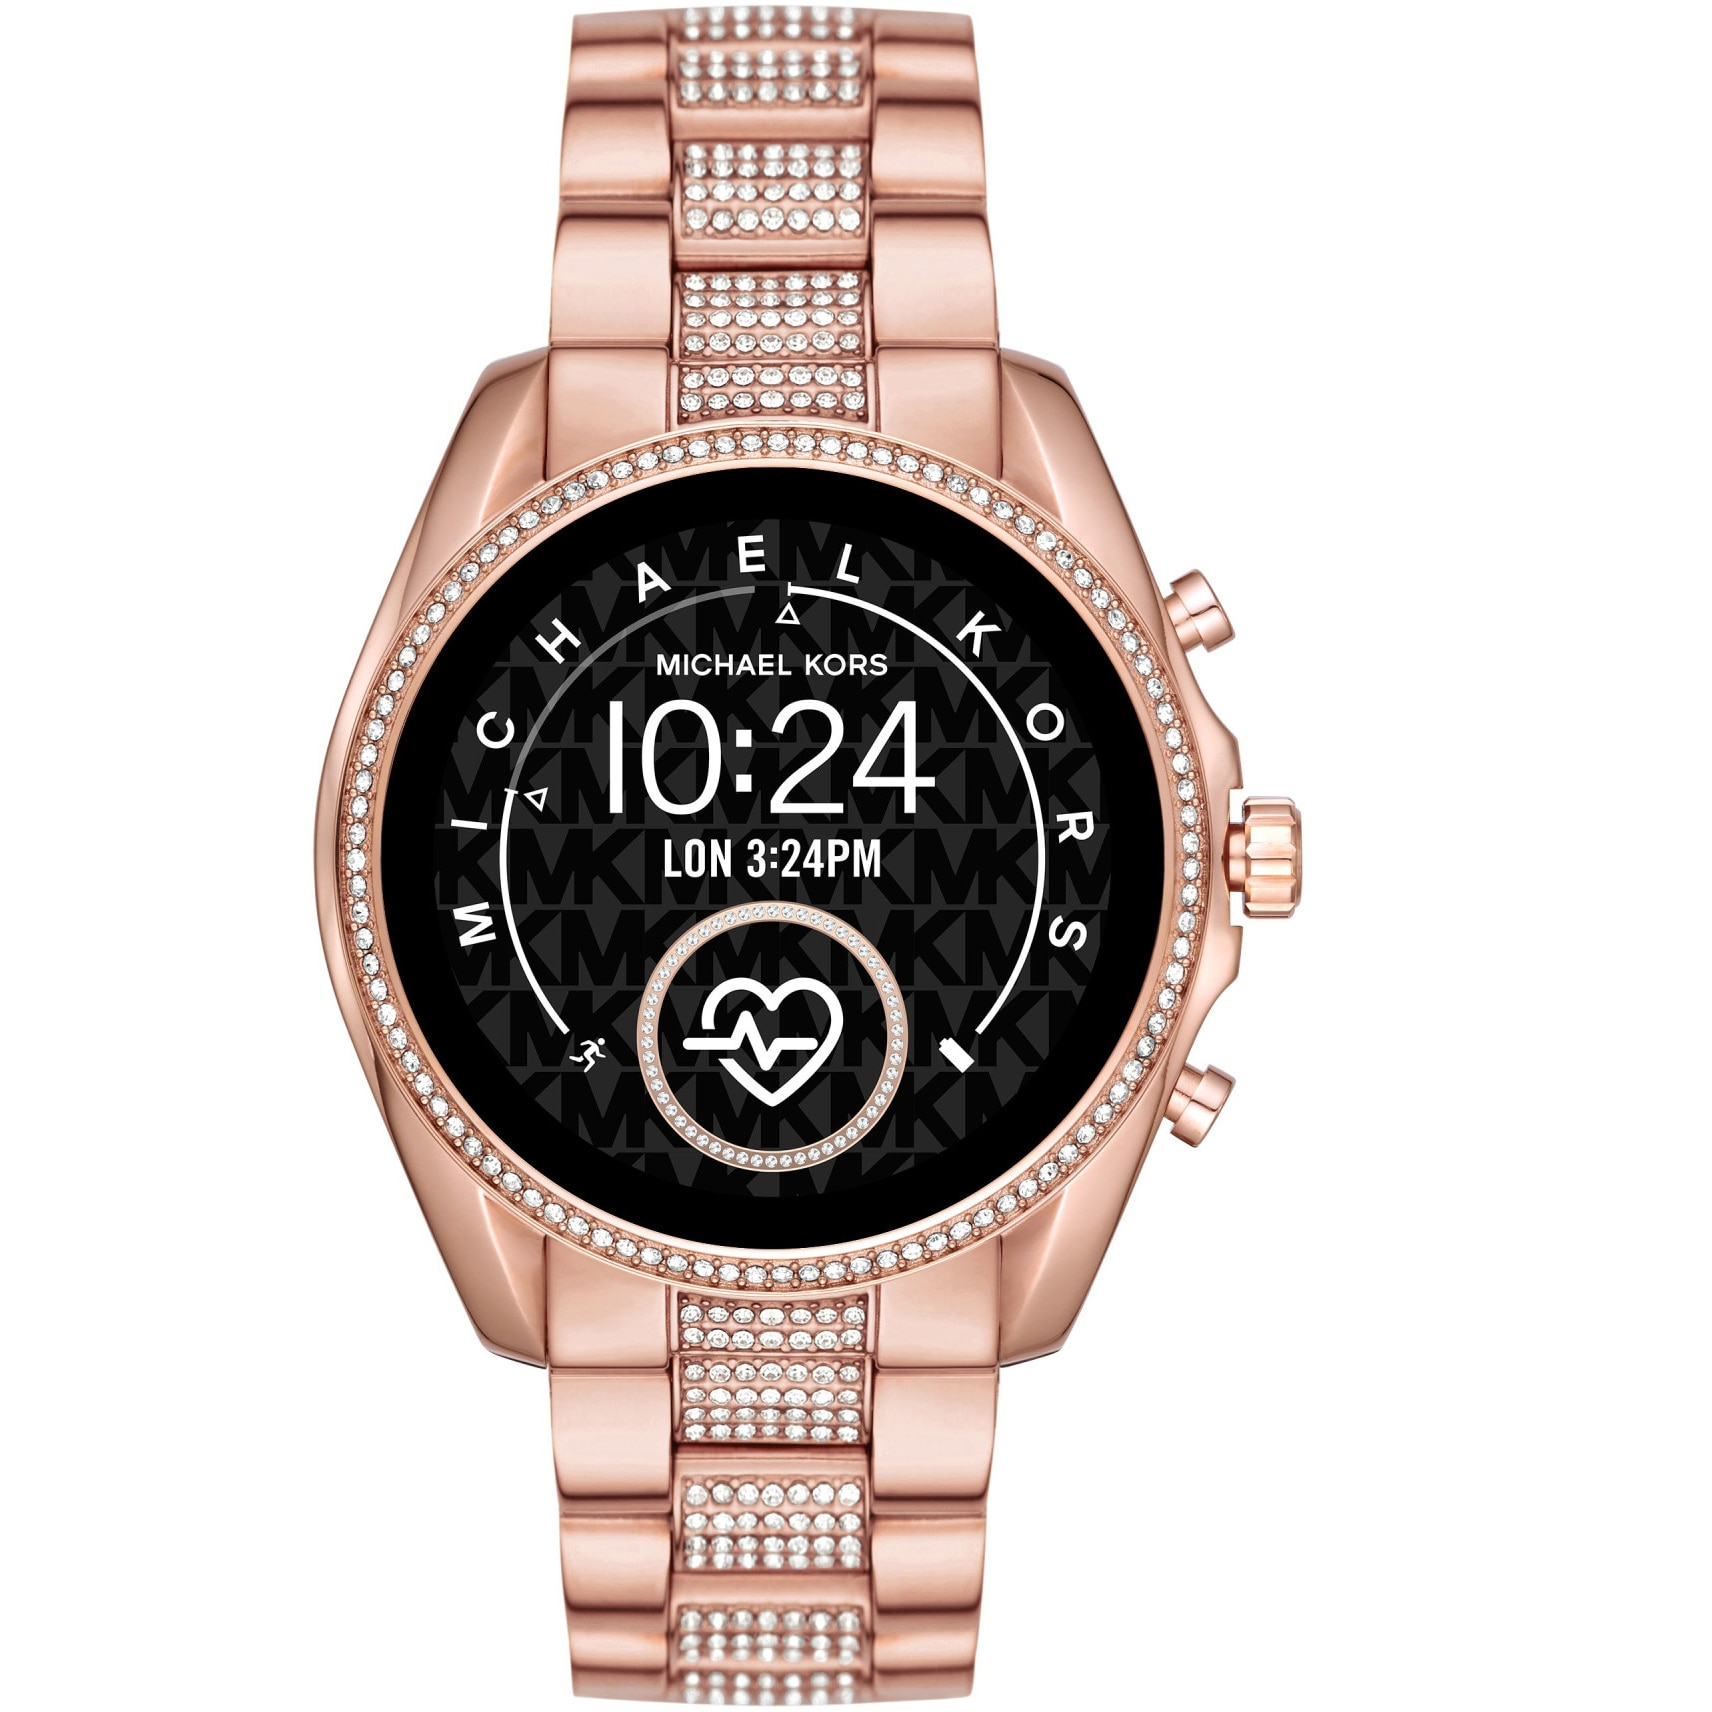 Fotografie Ceas Smartwatch Michael Kors Bradshaw 2, Rose Gold/Rose Gold Steel